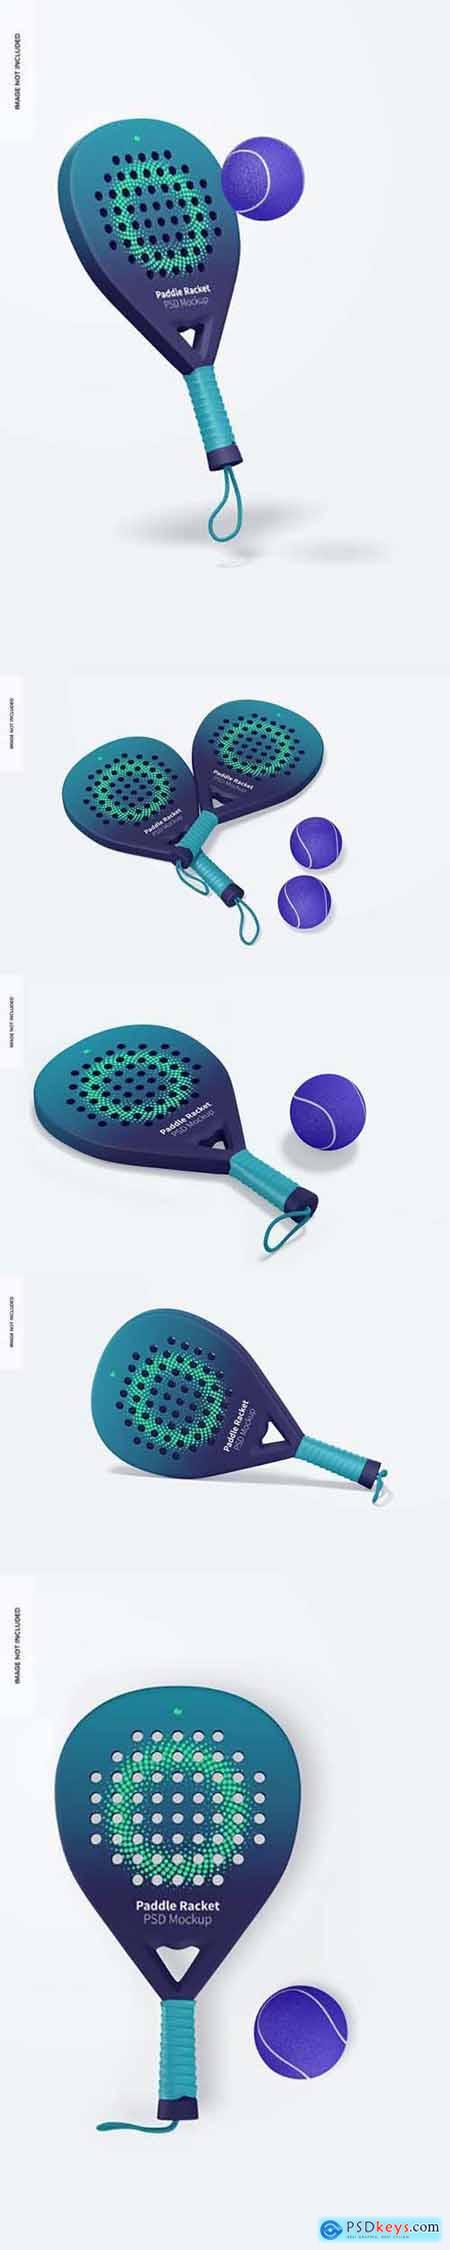 Paddle rackets mockup